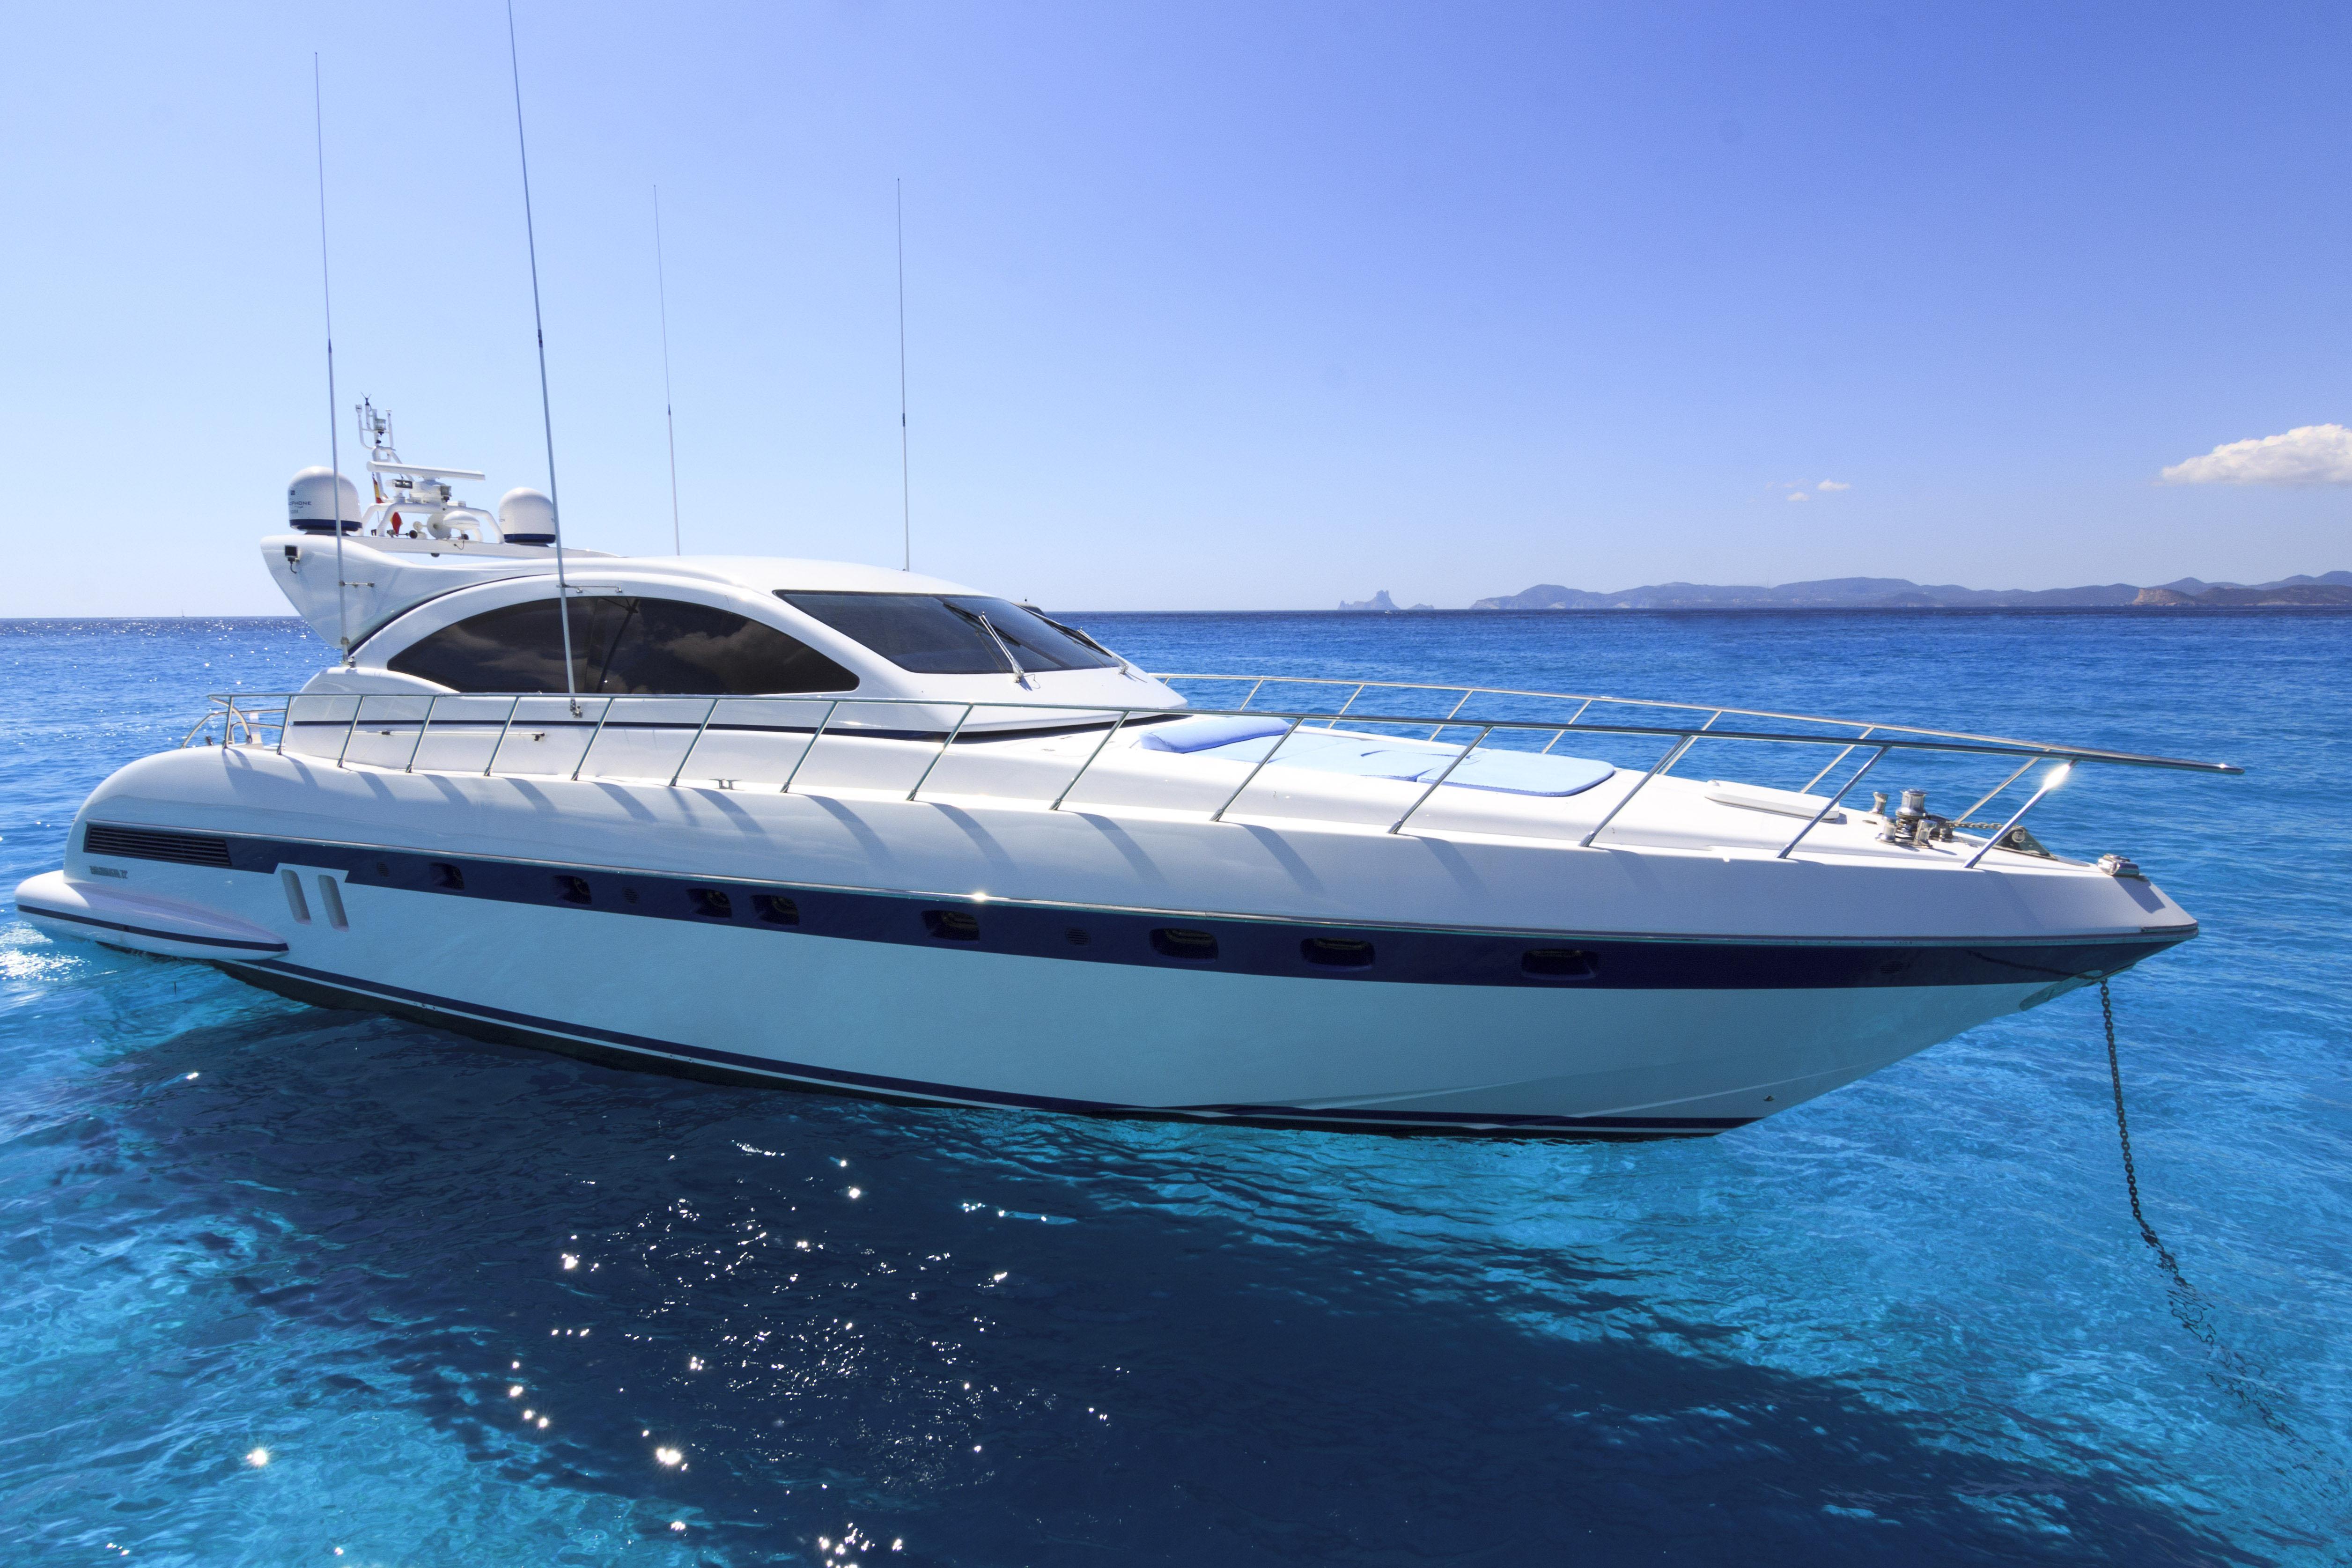 GAIA-SOFIA-yacht-for-sale-for-charter-vbs-01.jpg